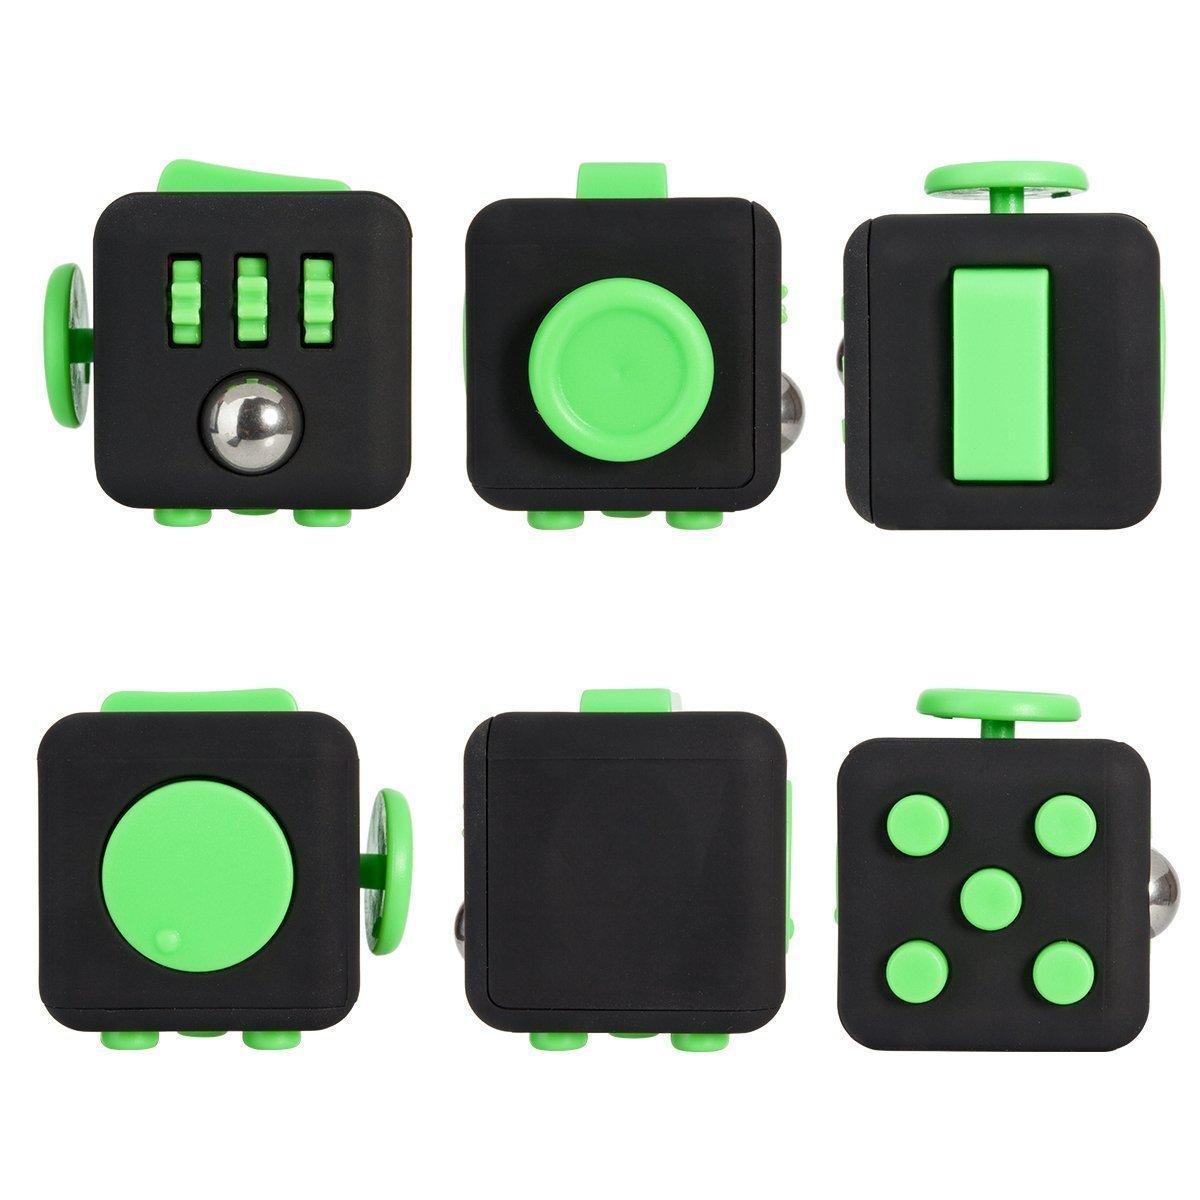 Vhem Fidget Cube 4751114723182